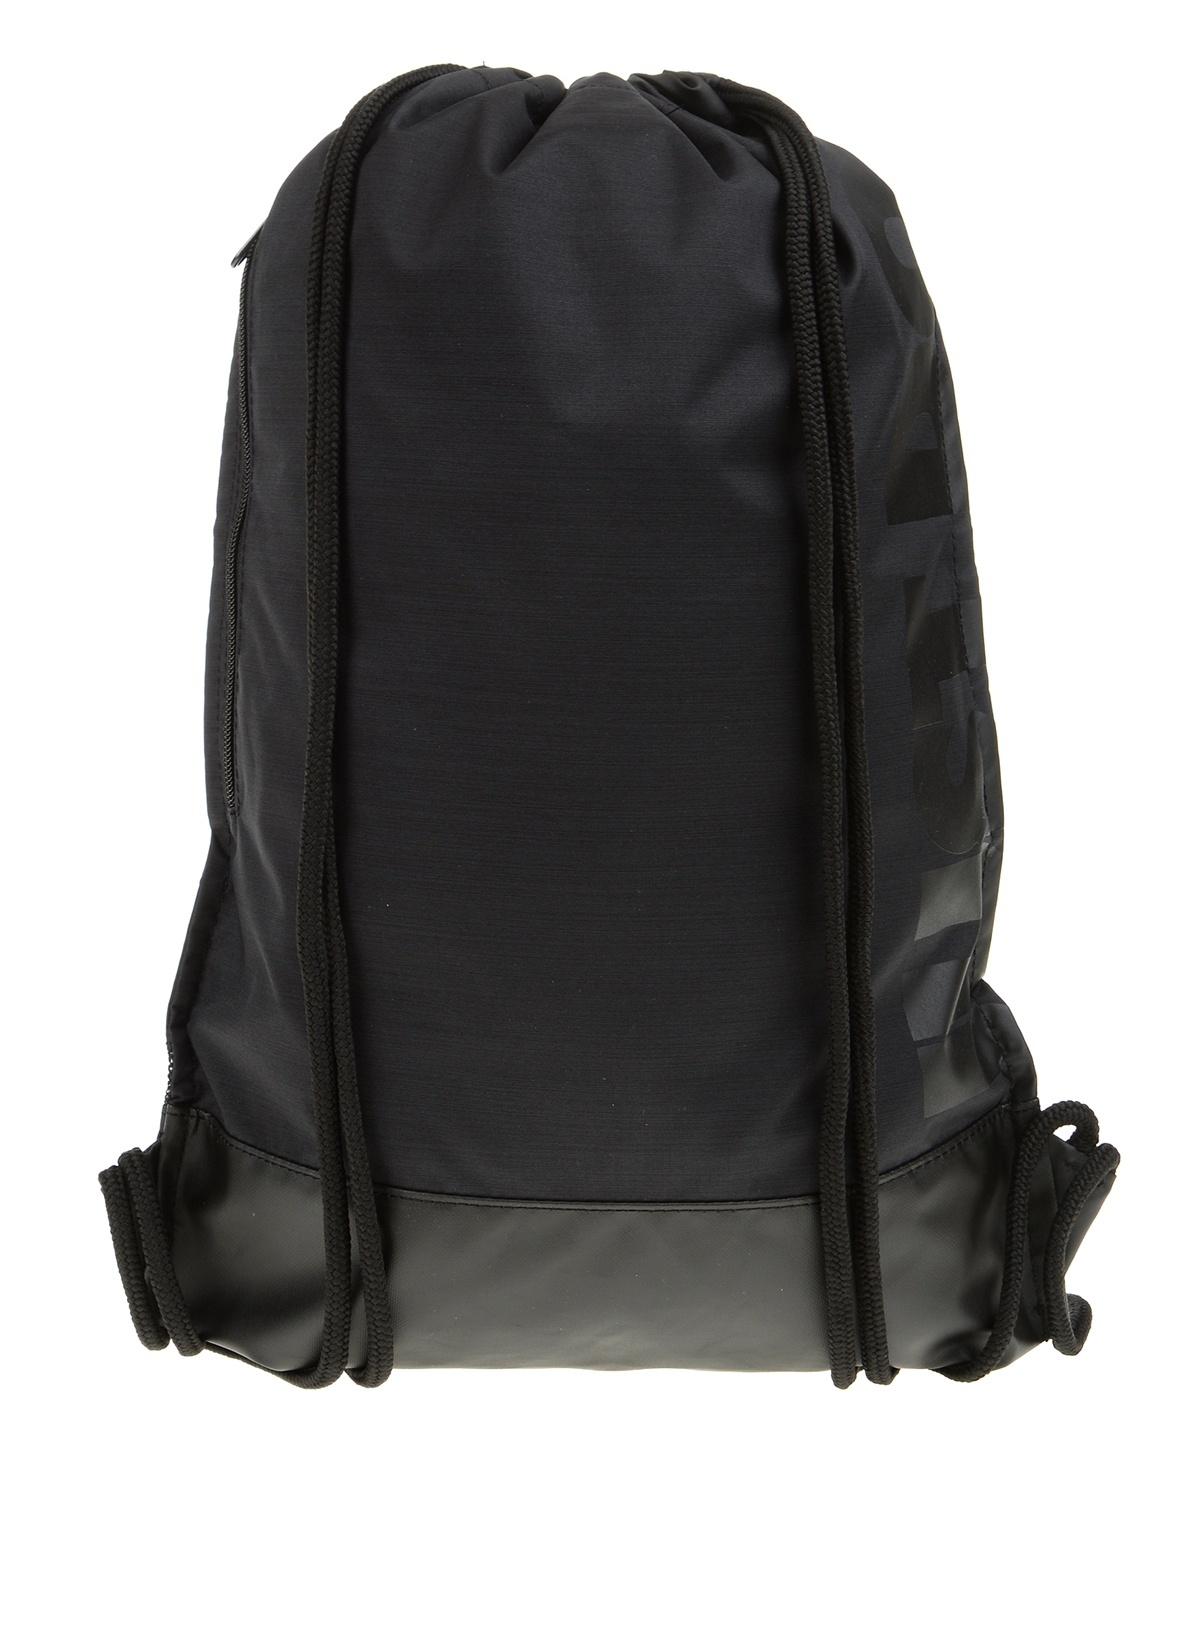 Nike Unisex Spor Çantası Black Black White   Morhipo   19588570 f37cbf5ddb